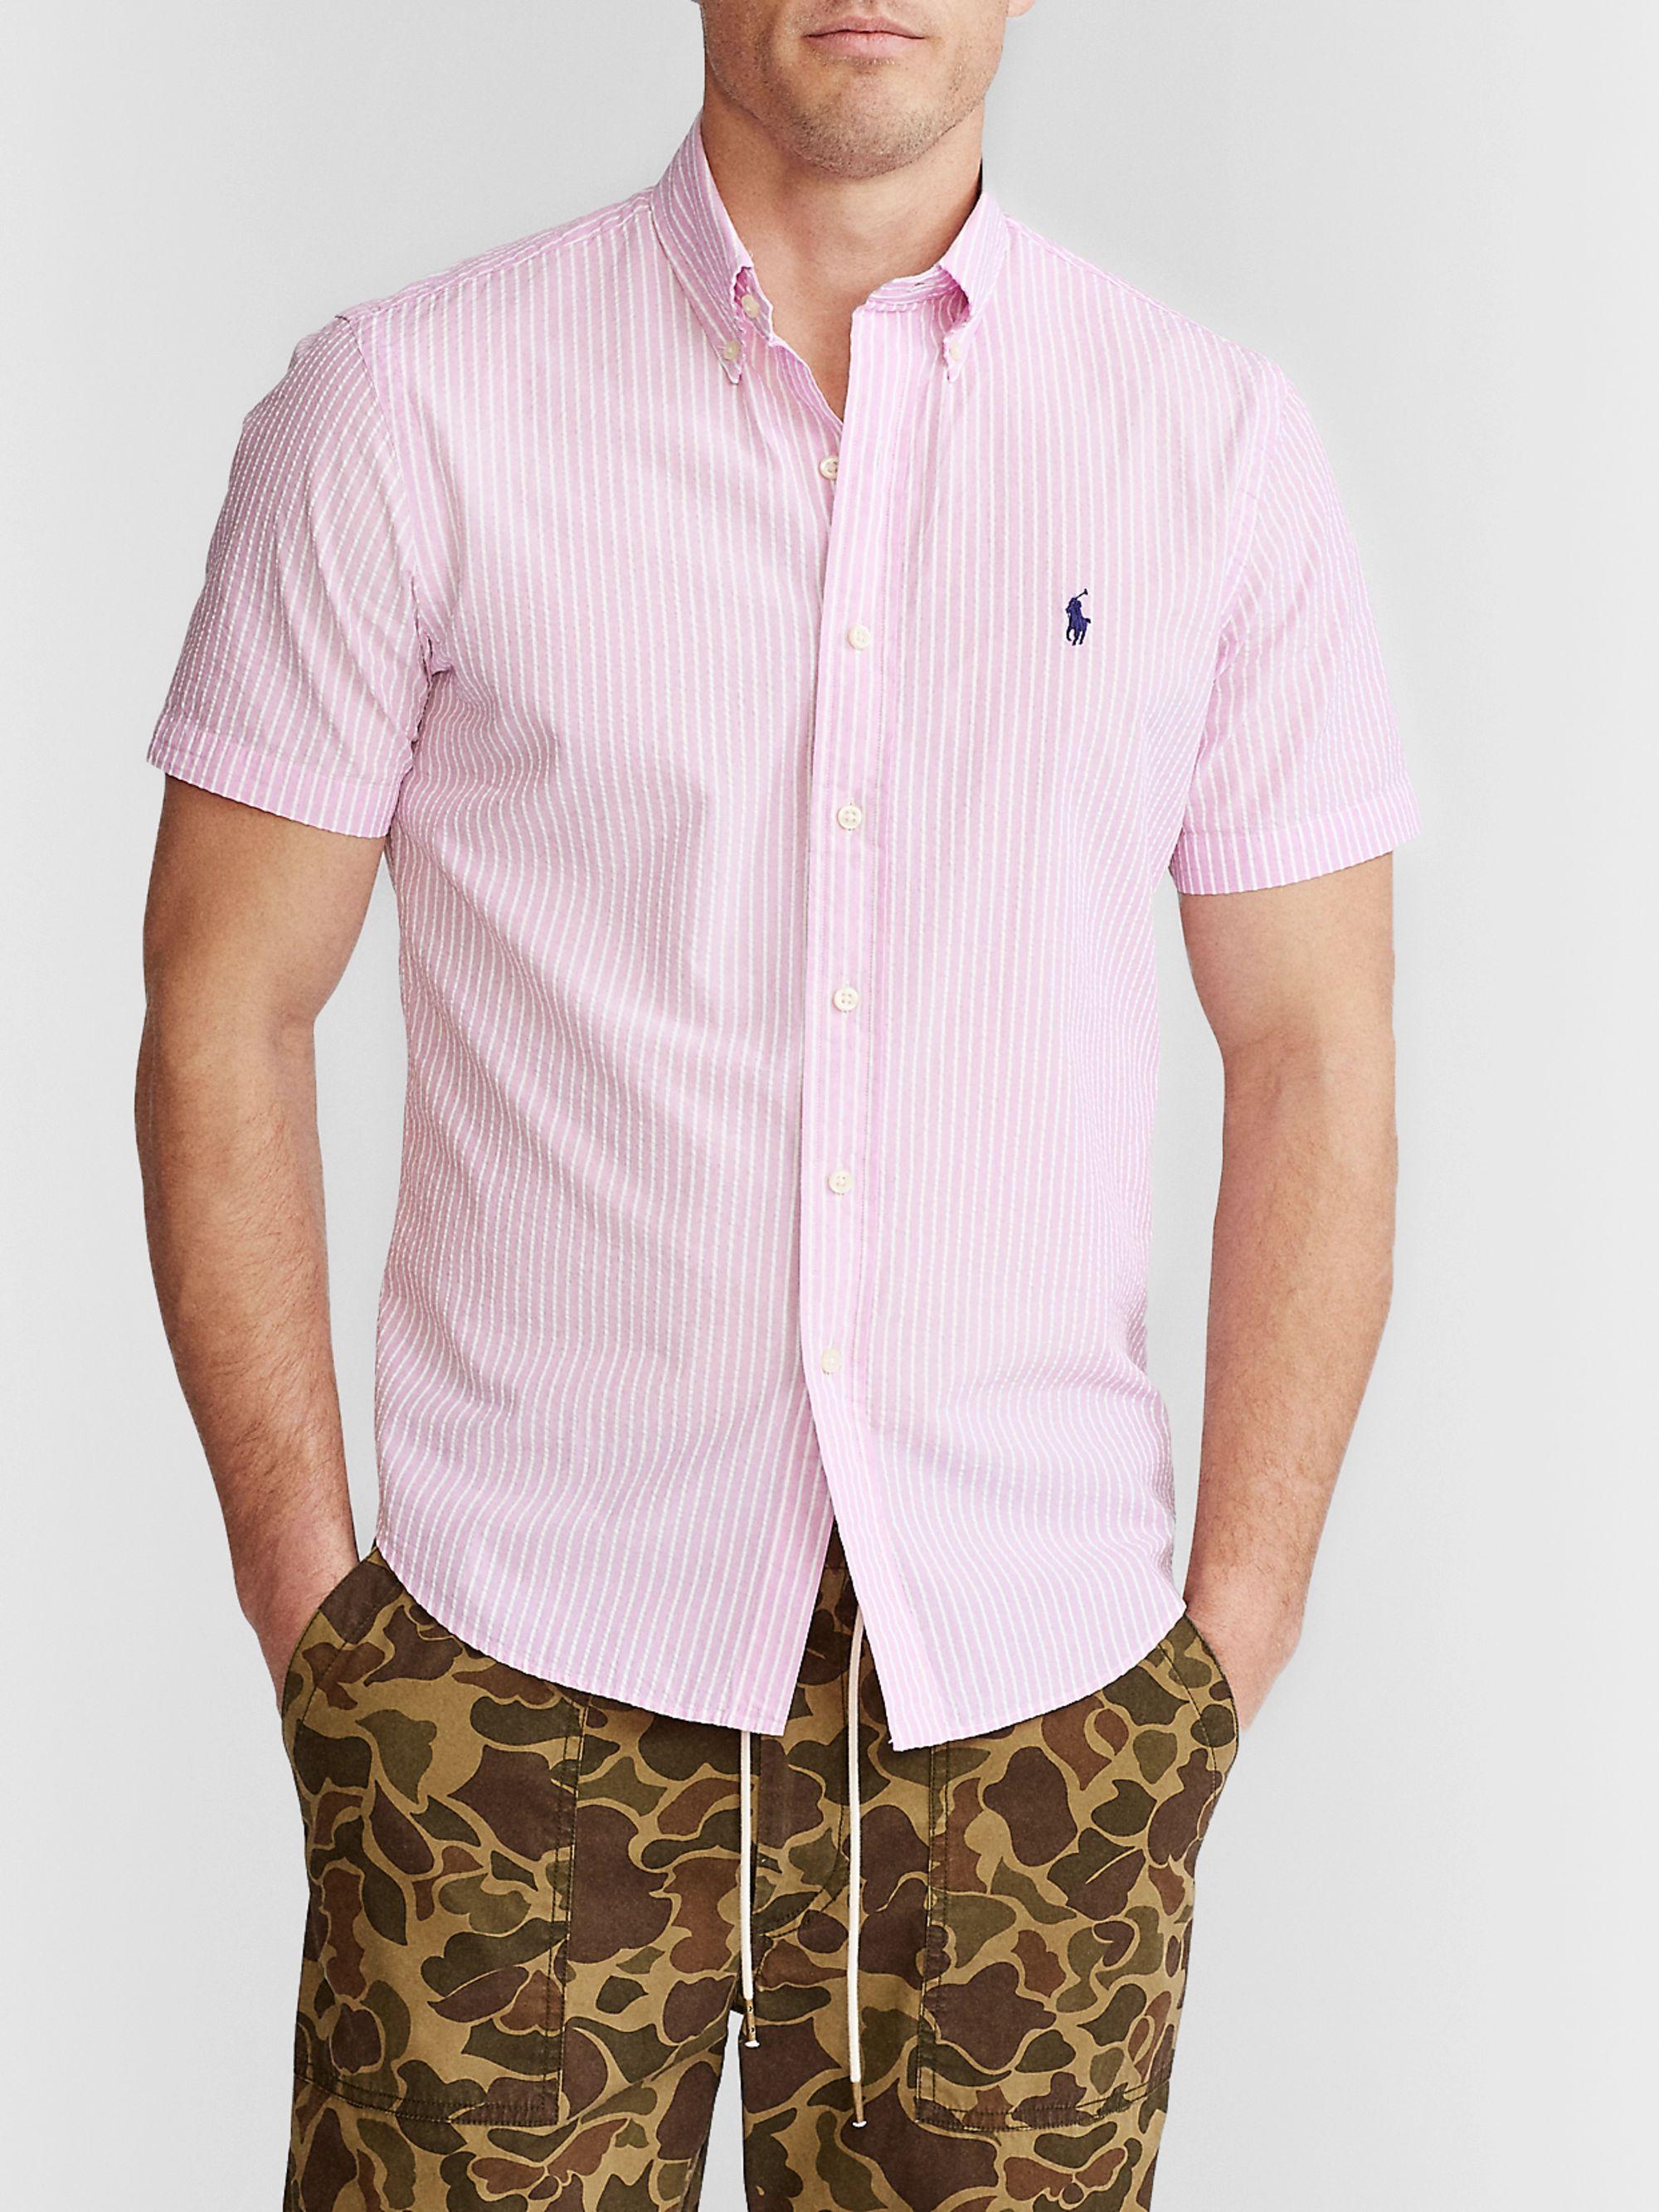 Pink Striped Cotton Seersucker Shirt Polo Ralph Lauren Mr Porter